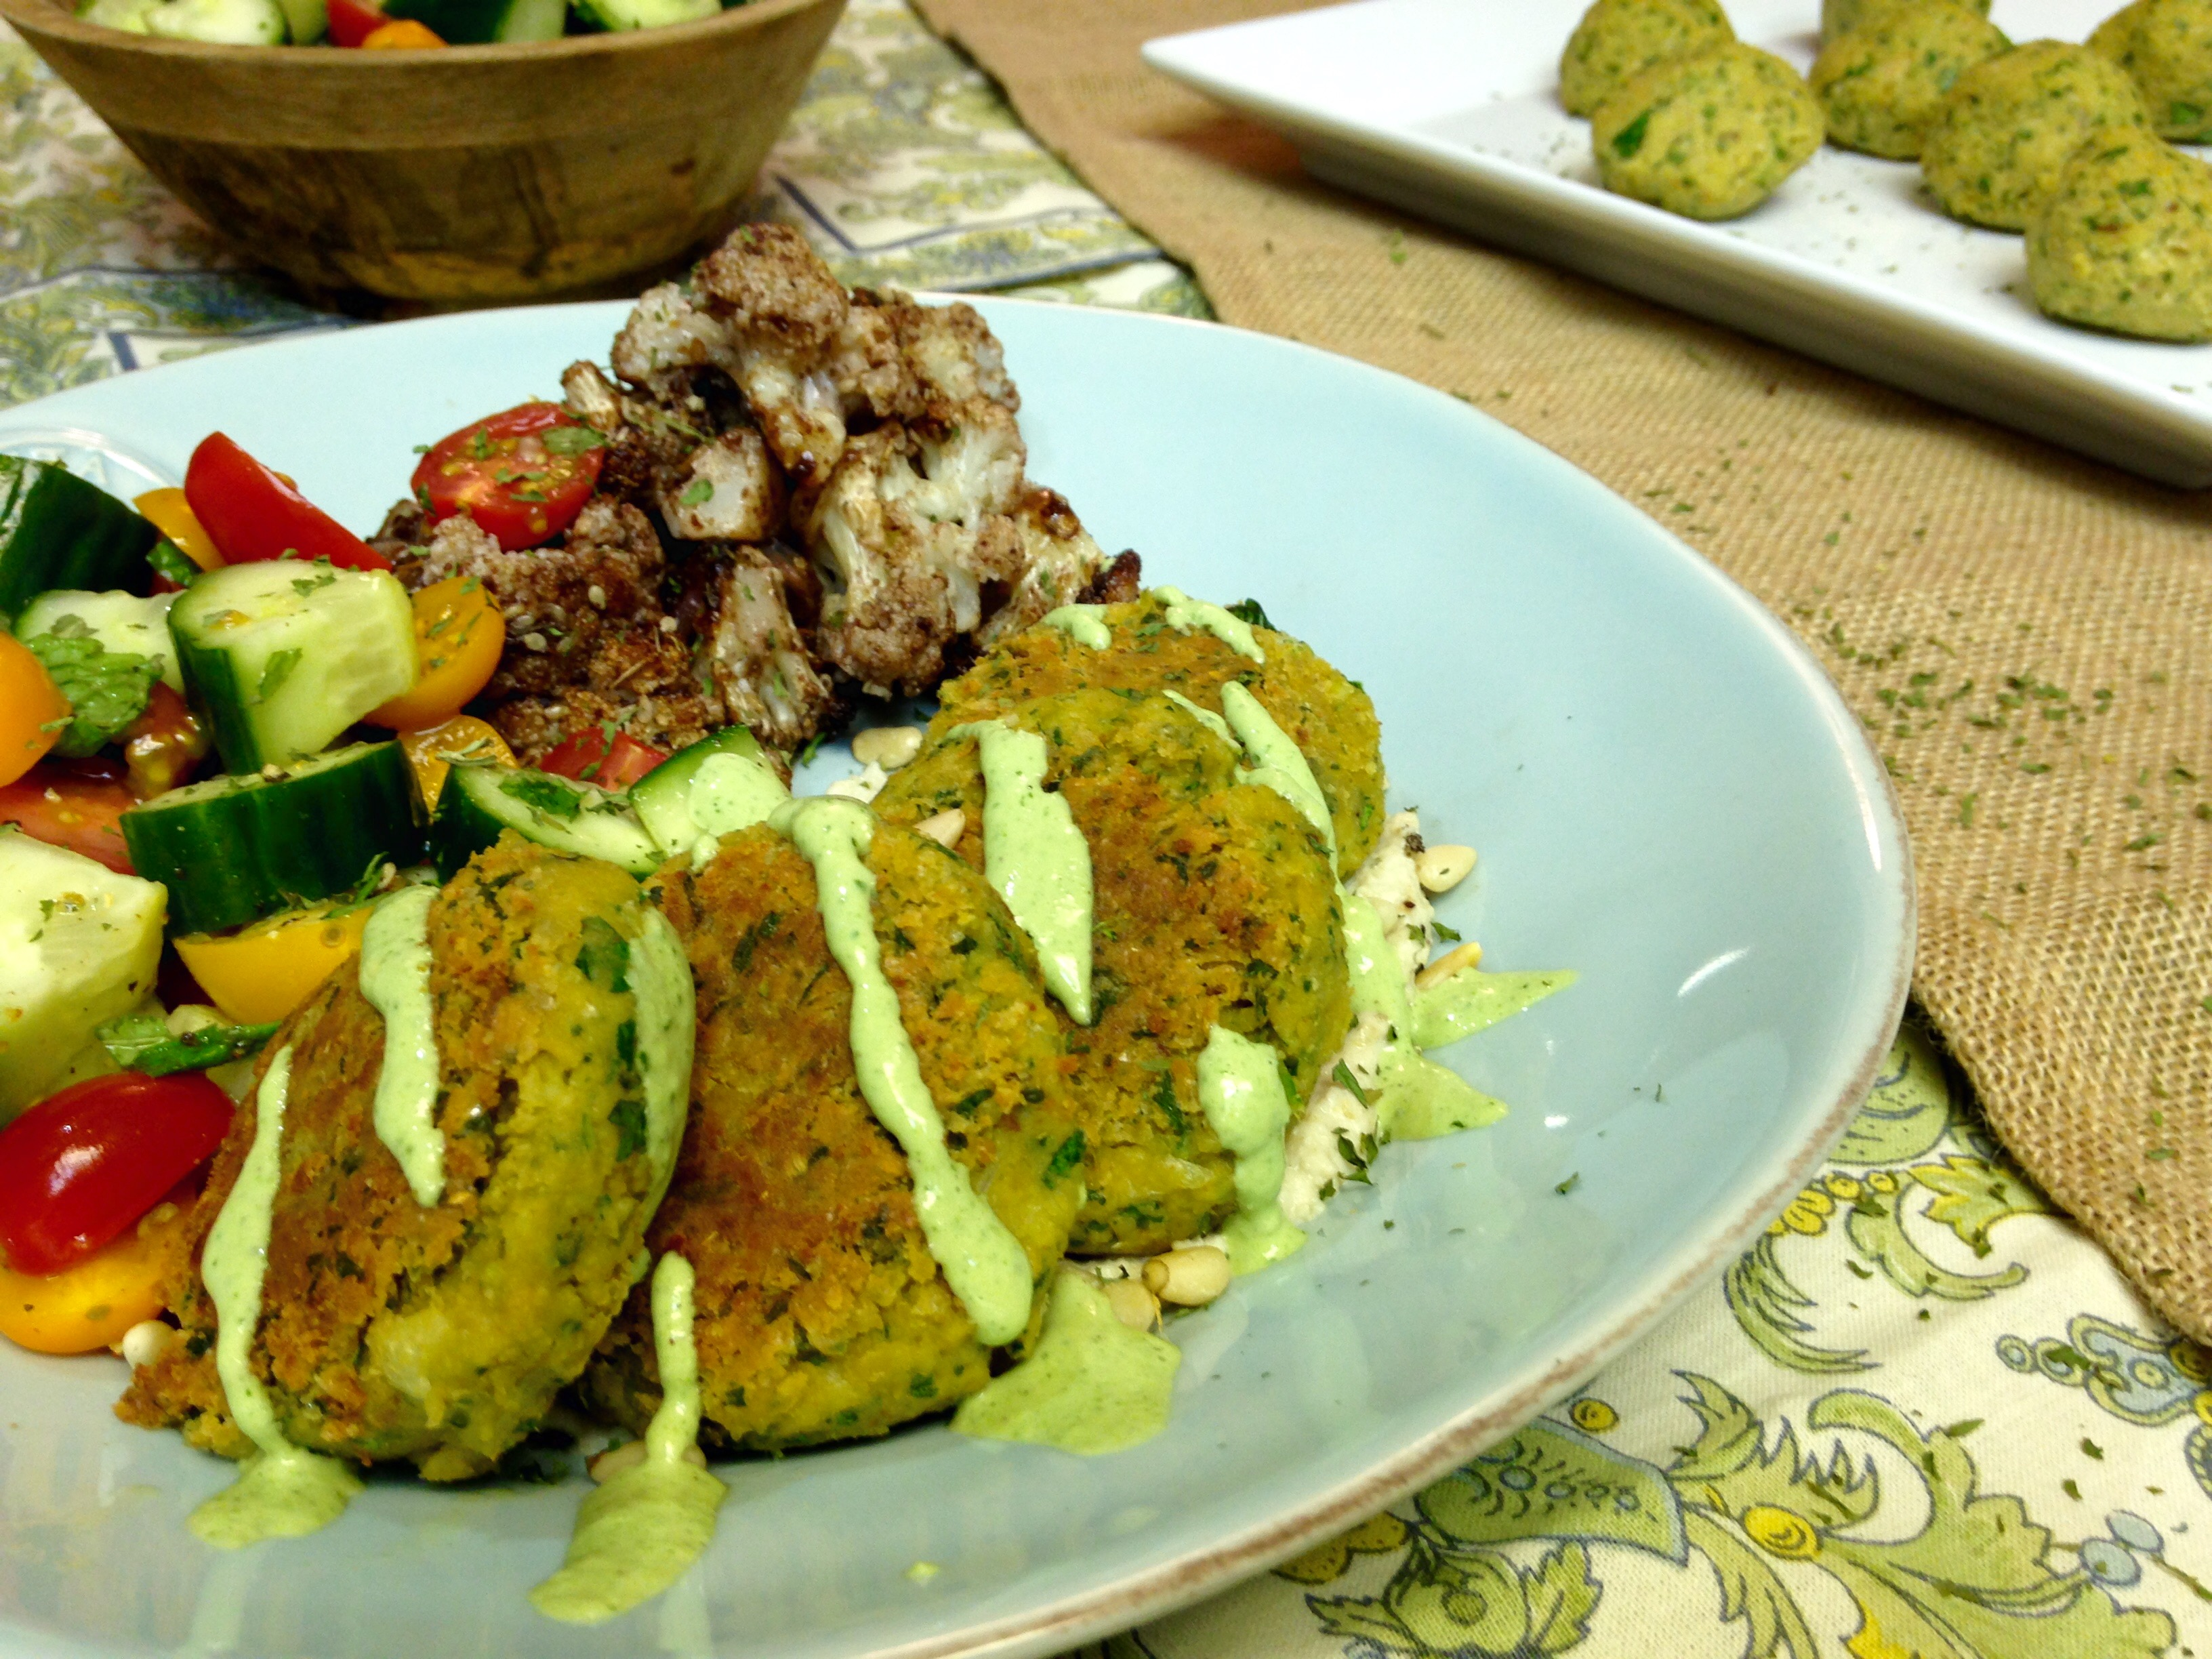 Falafels, Roasted Veg, Baba Ganoush & Mint Tahini Sauce